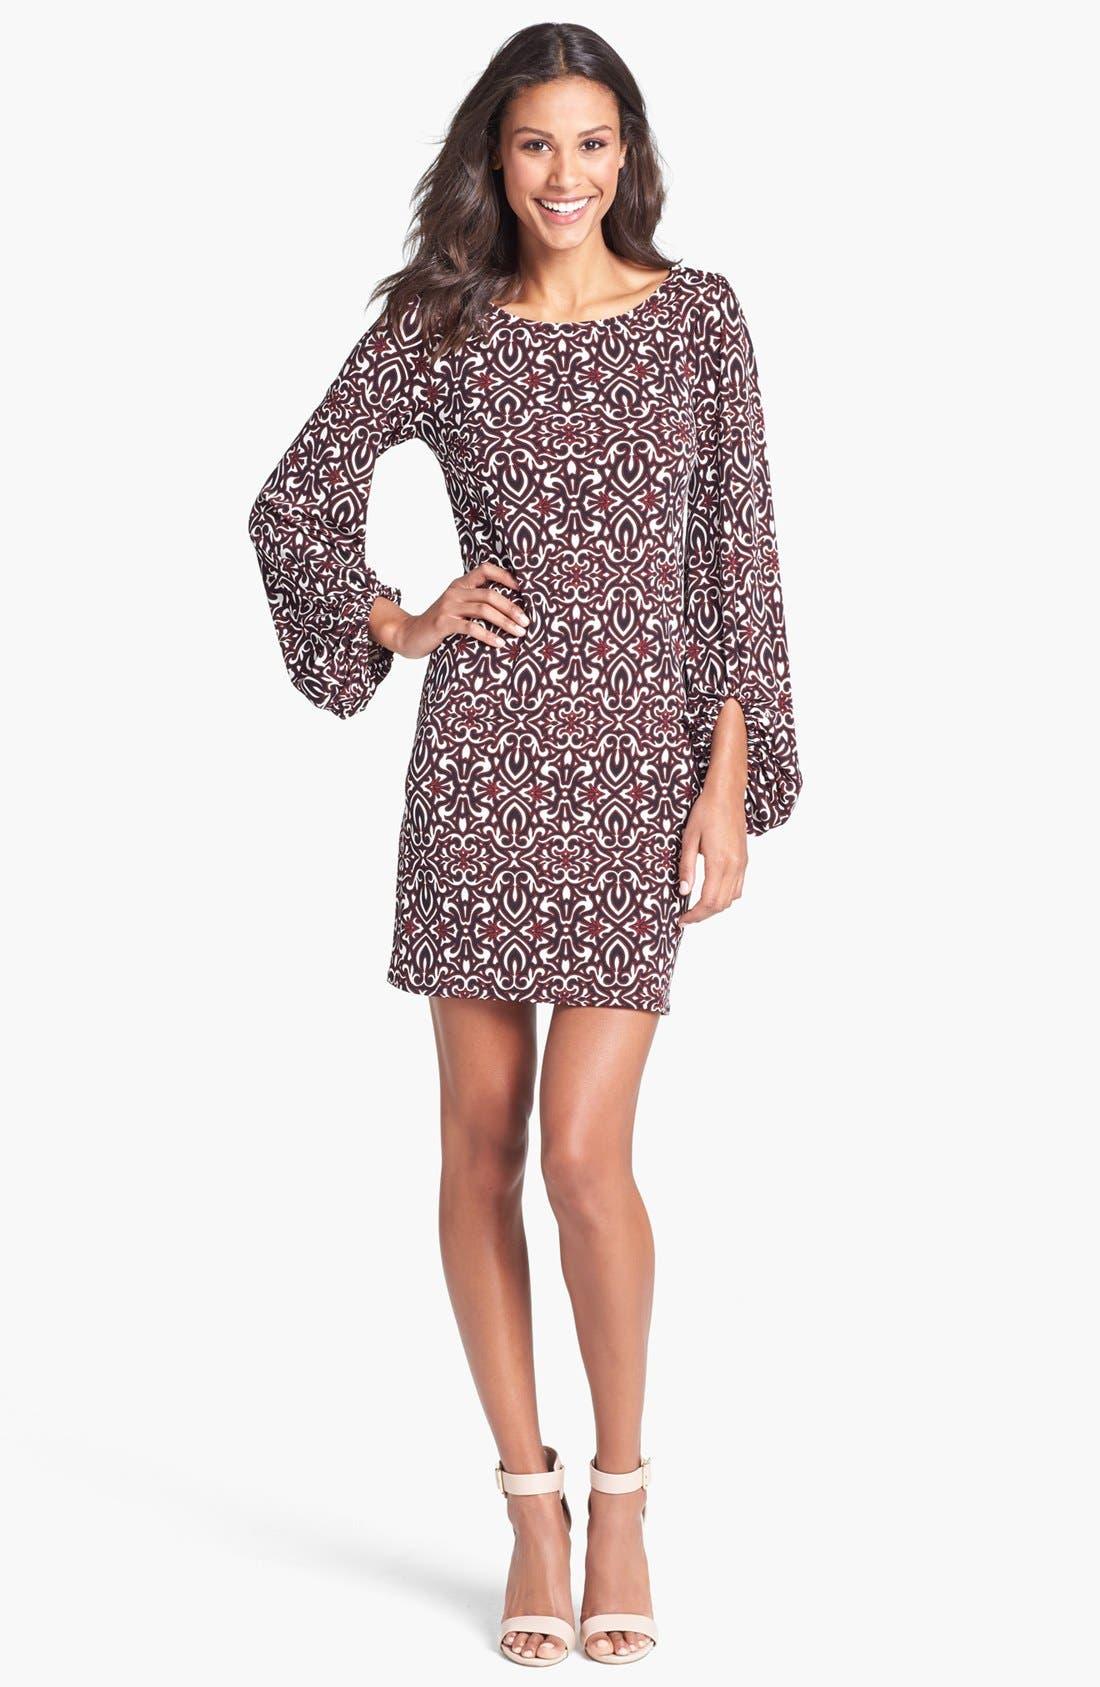 Alternate Image 1 Selected - Laundry by Shelli Segal Blouson Sleeve Print Jersey Dress (Regular & Petite)